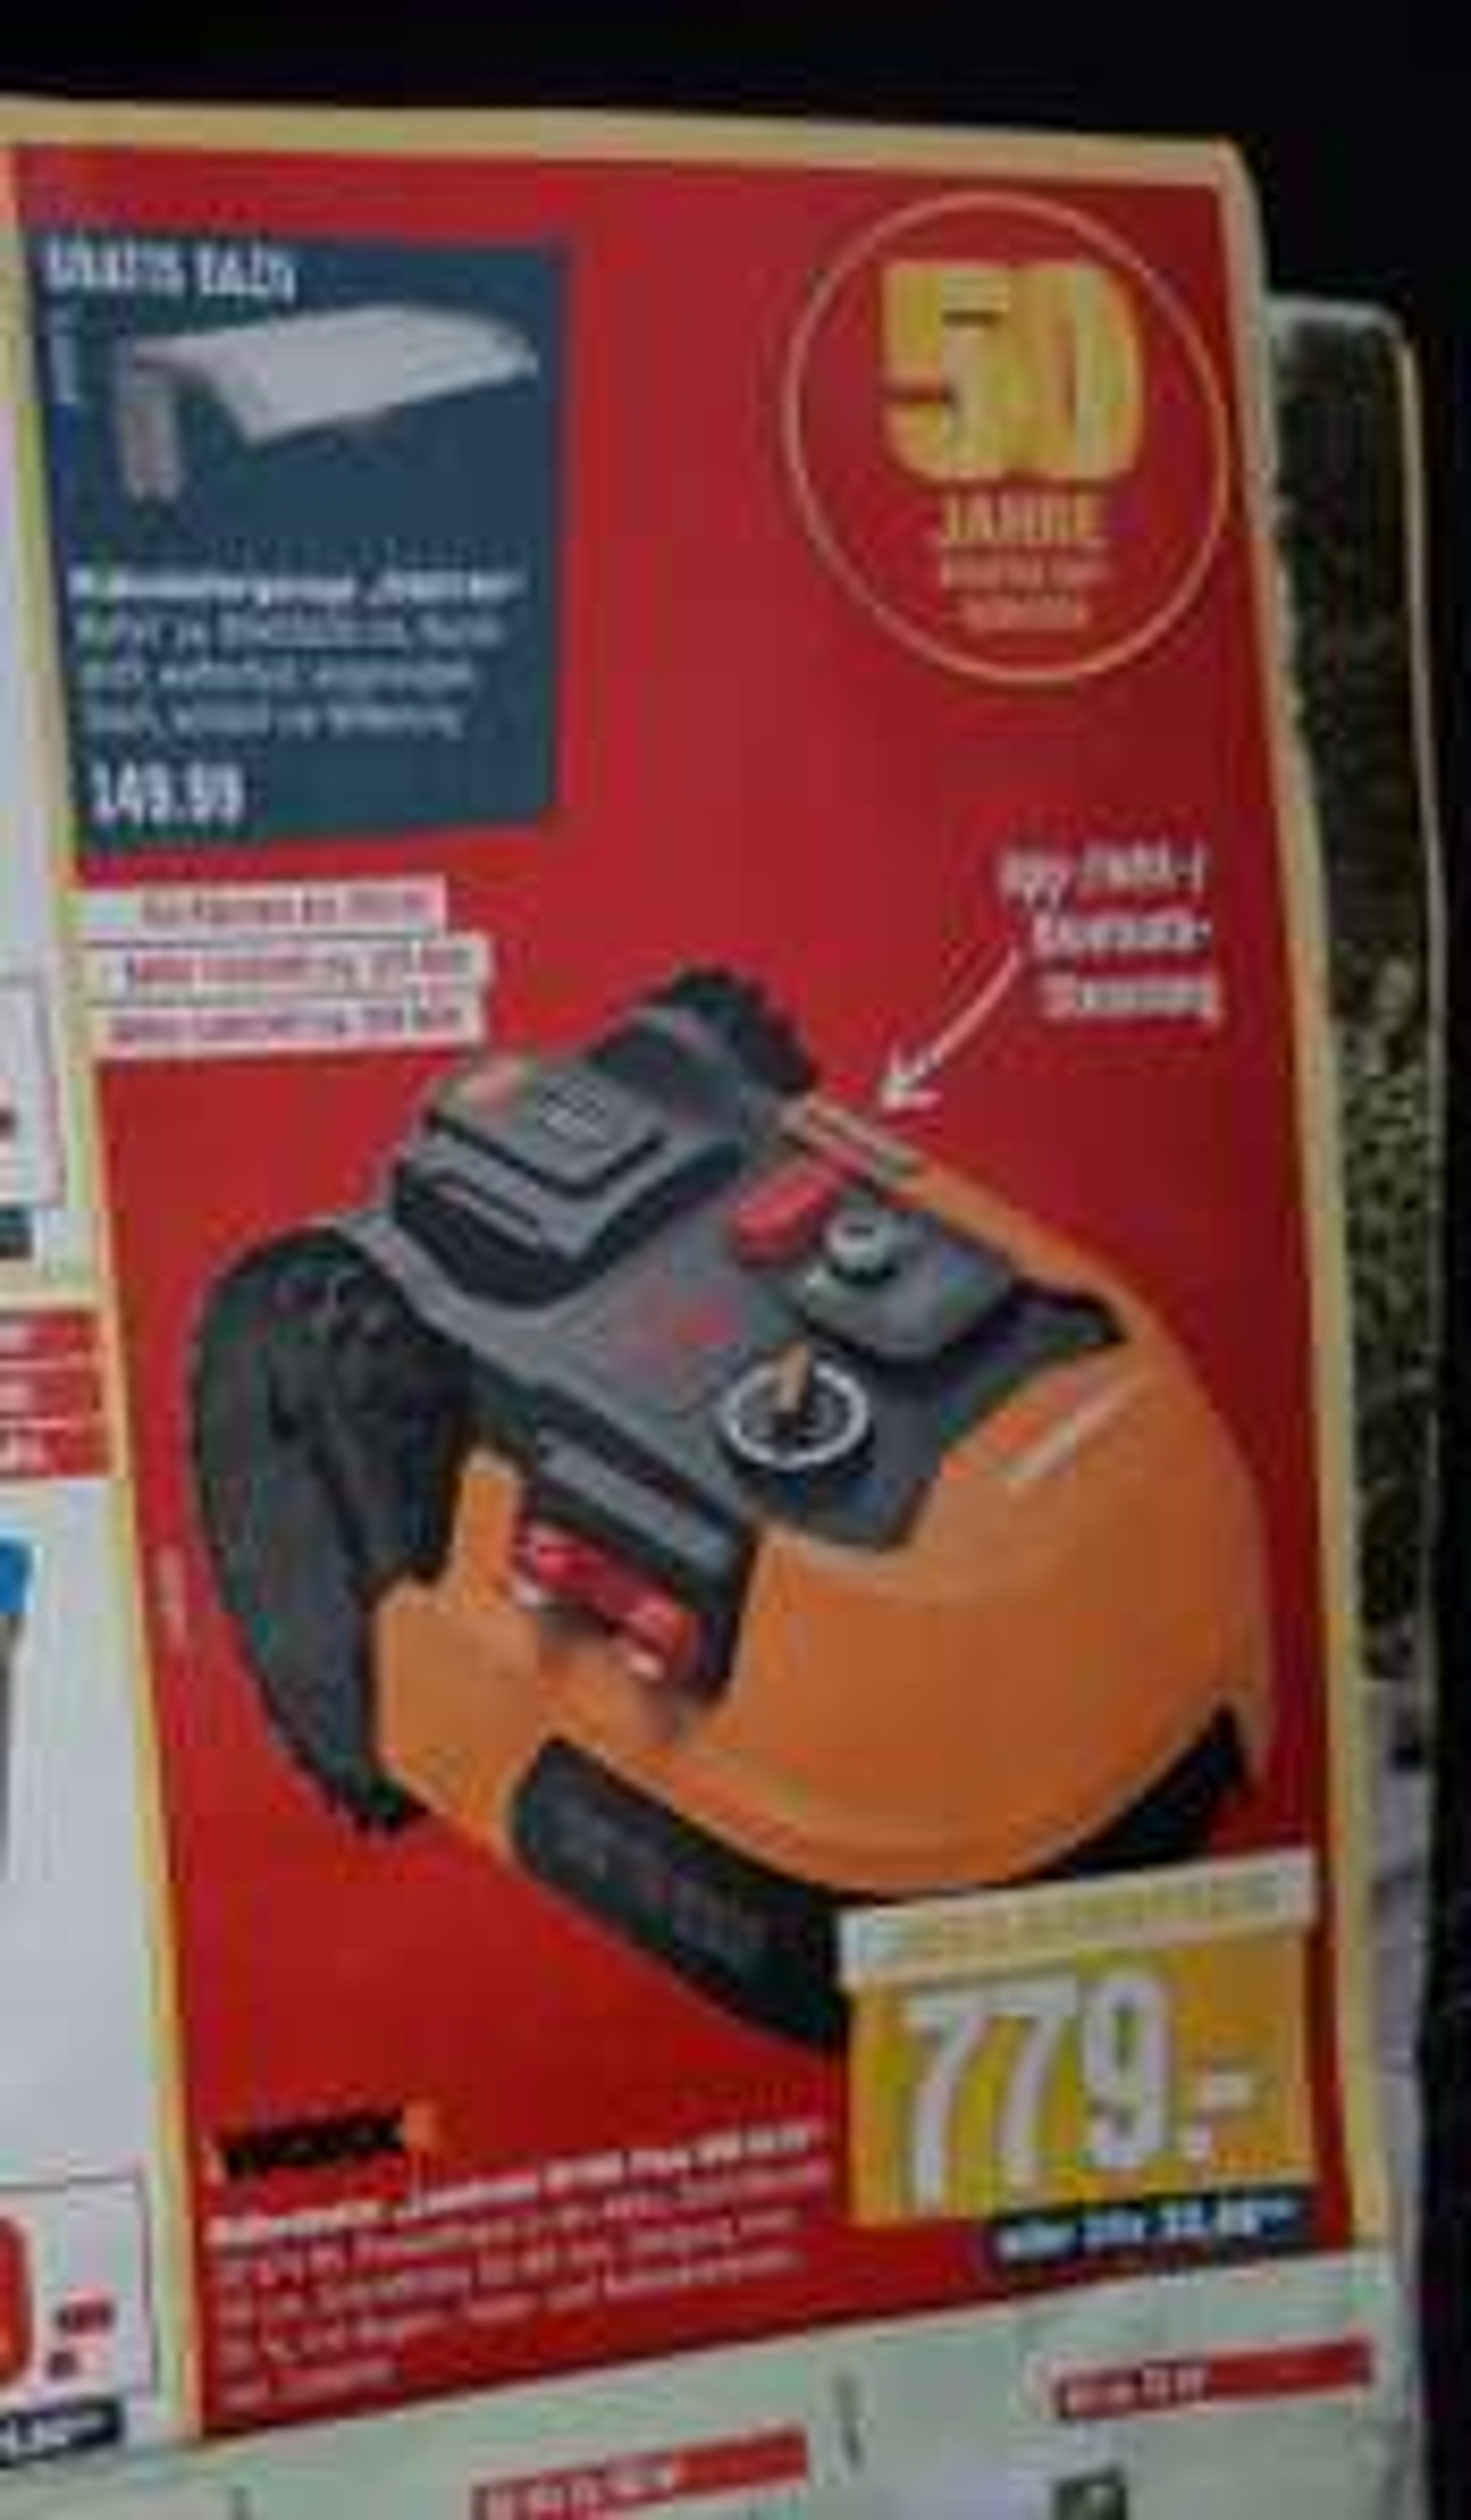 [Hellweg] Mähroboter Worx Landroid M700 2.0 Plus WR167E (2021) + Gratis Garage